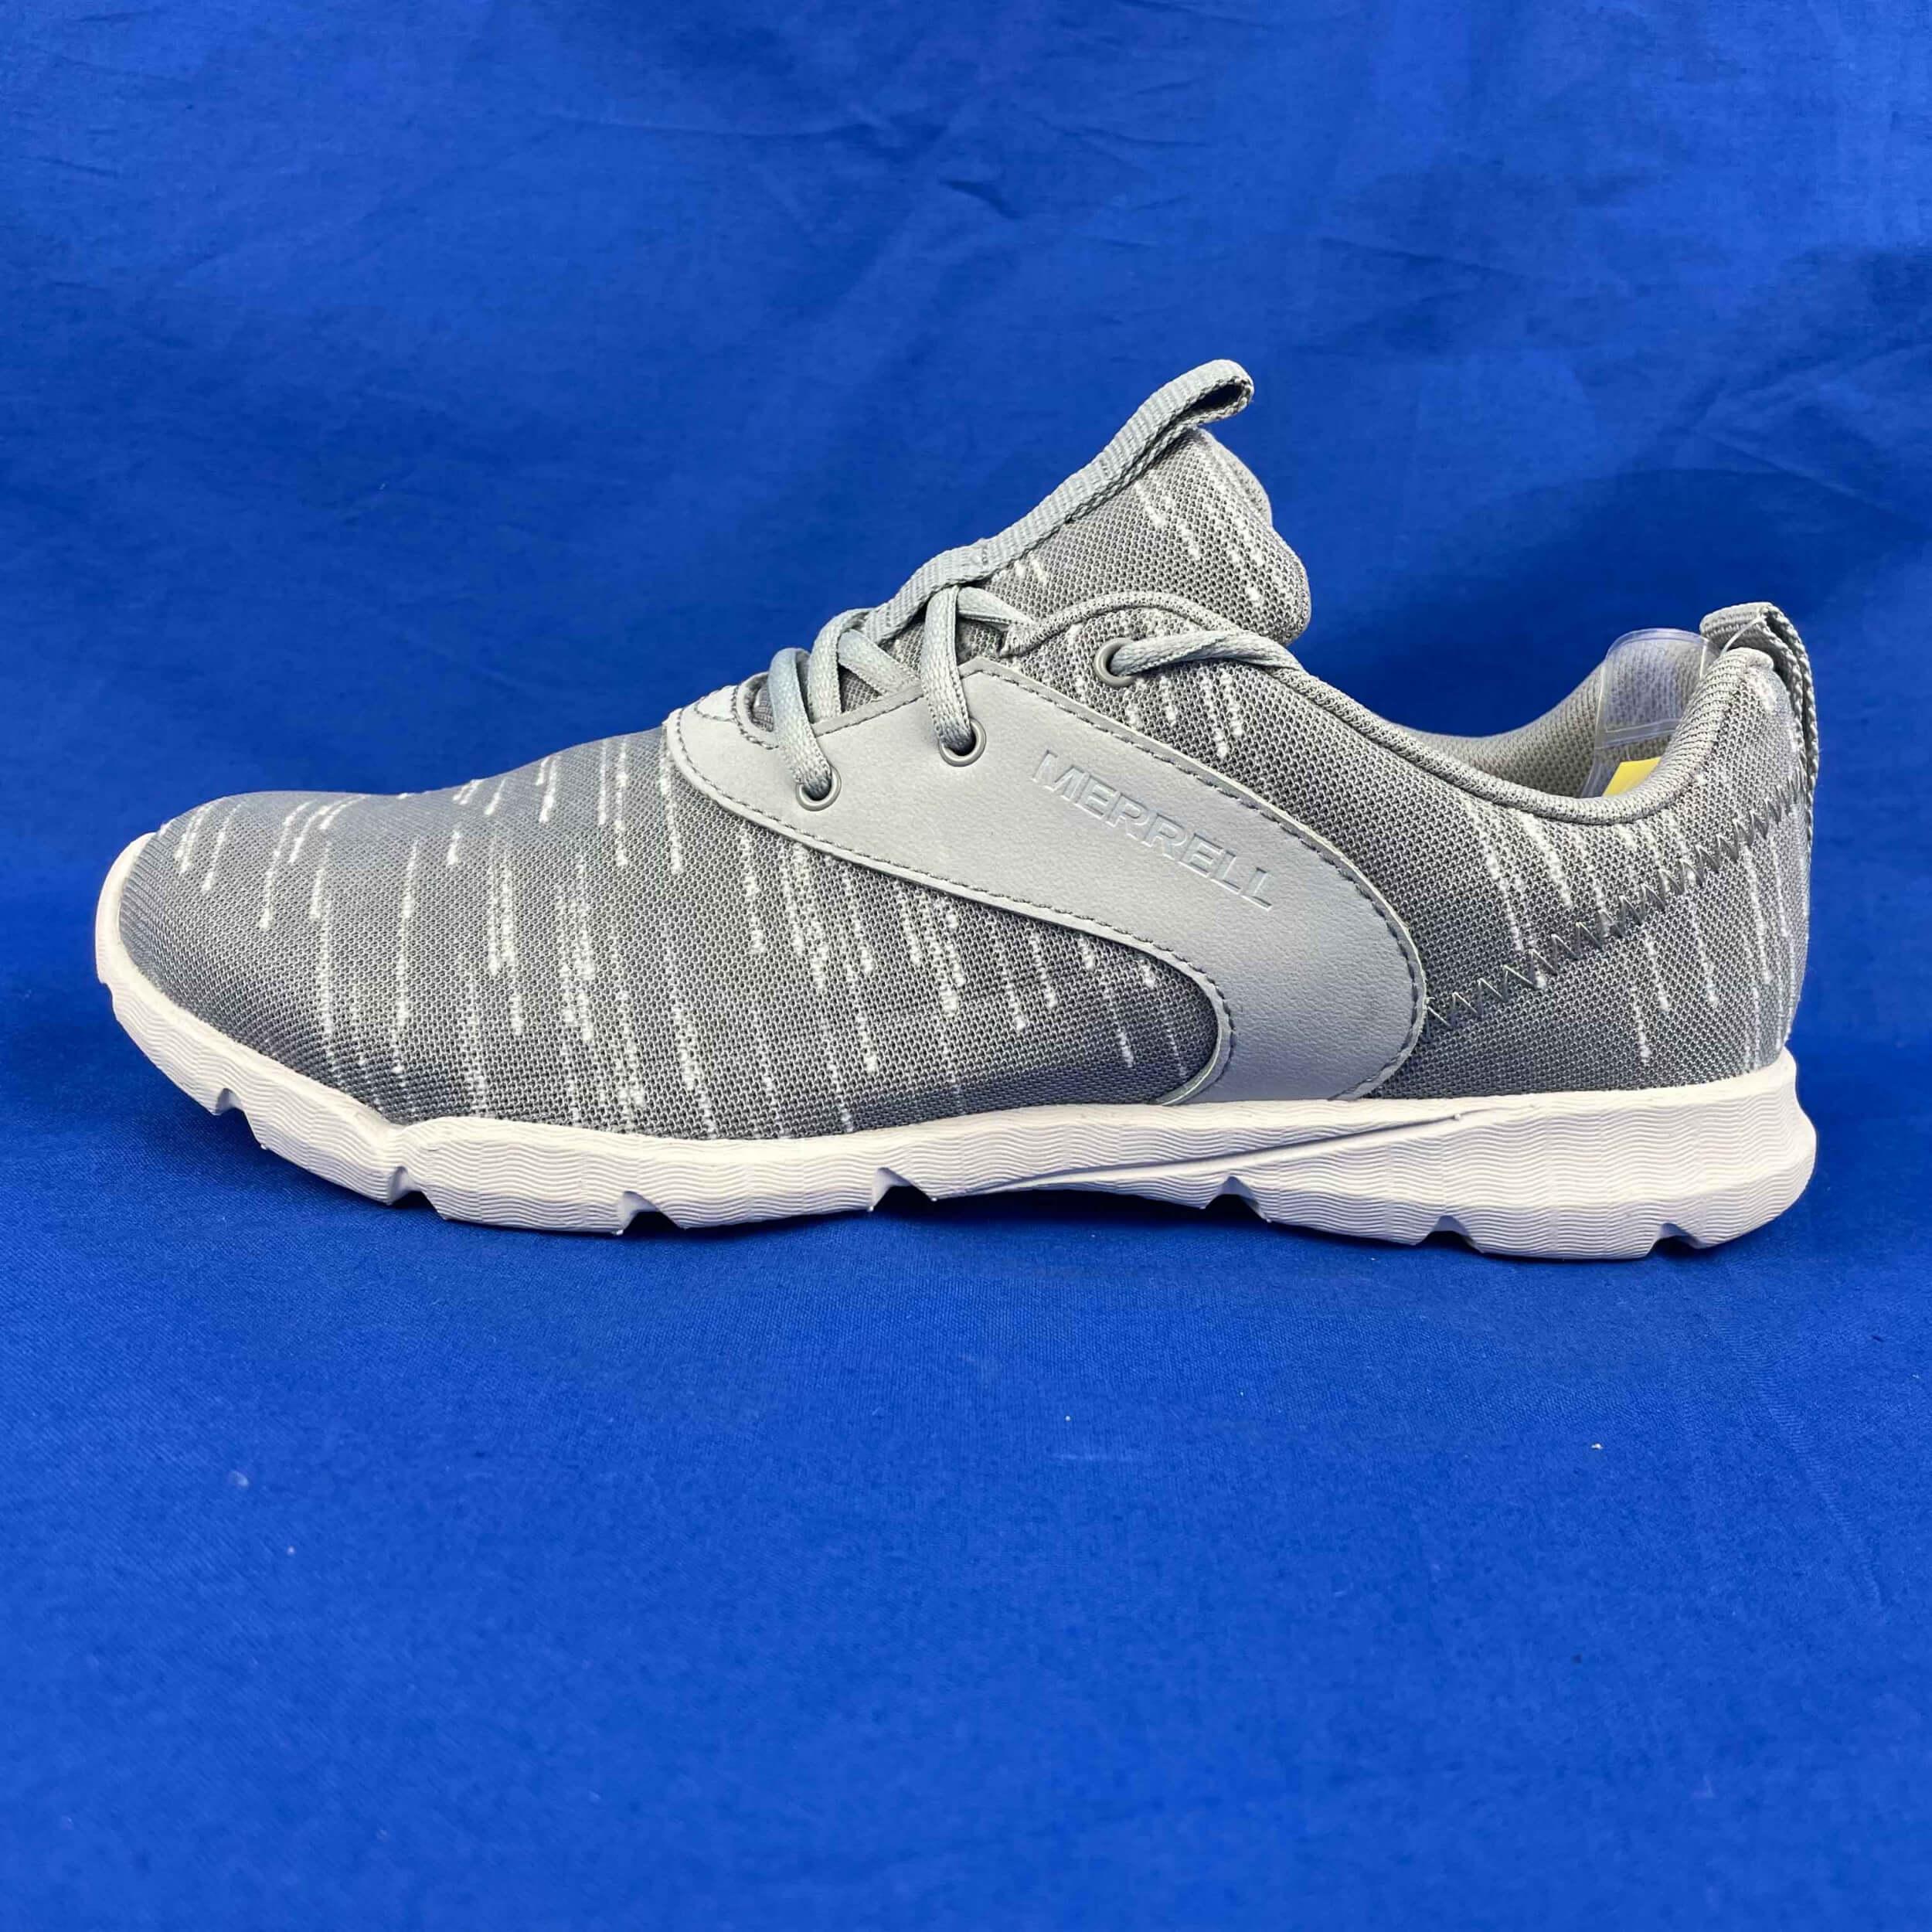 Merrell Damen Schuhe Flora Day Lace J90478 grau